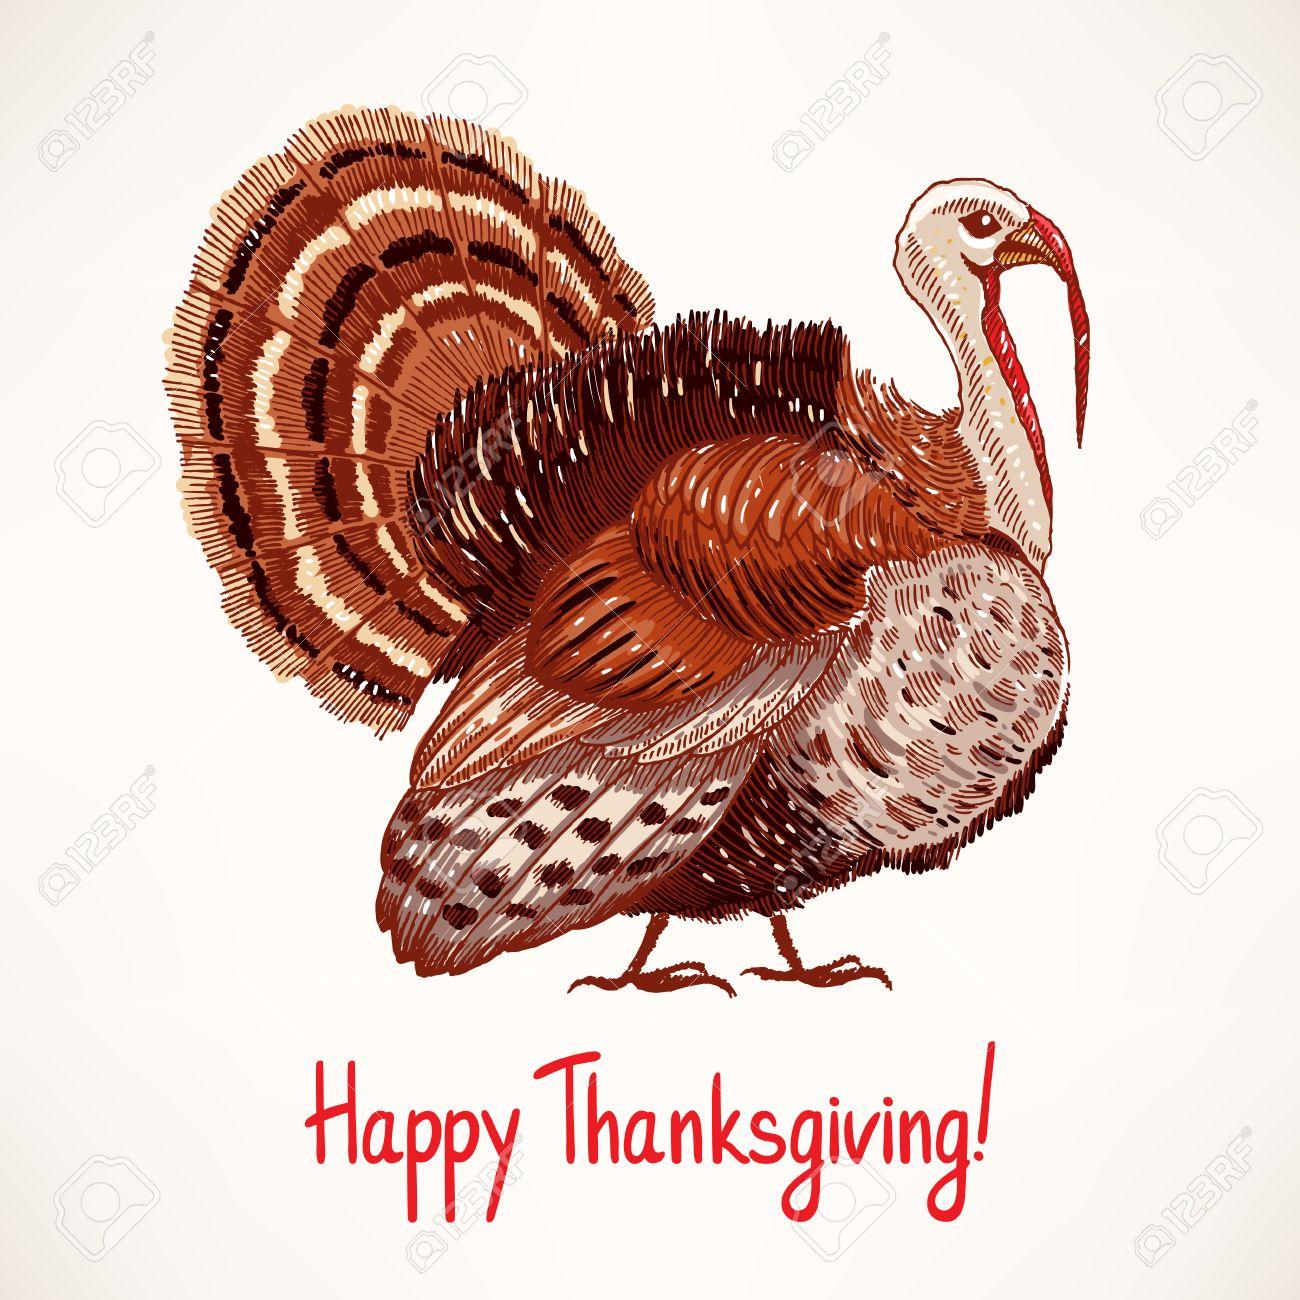 cute hand drawn turkey sketch card for thanksgiving day 2